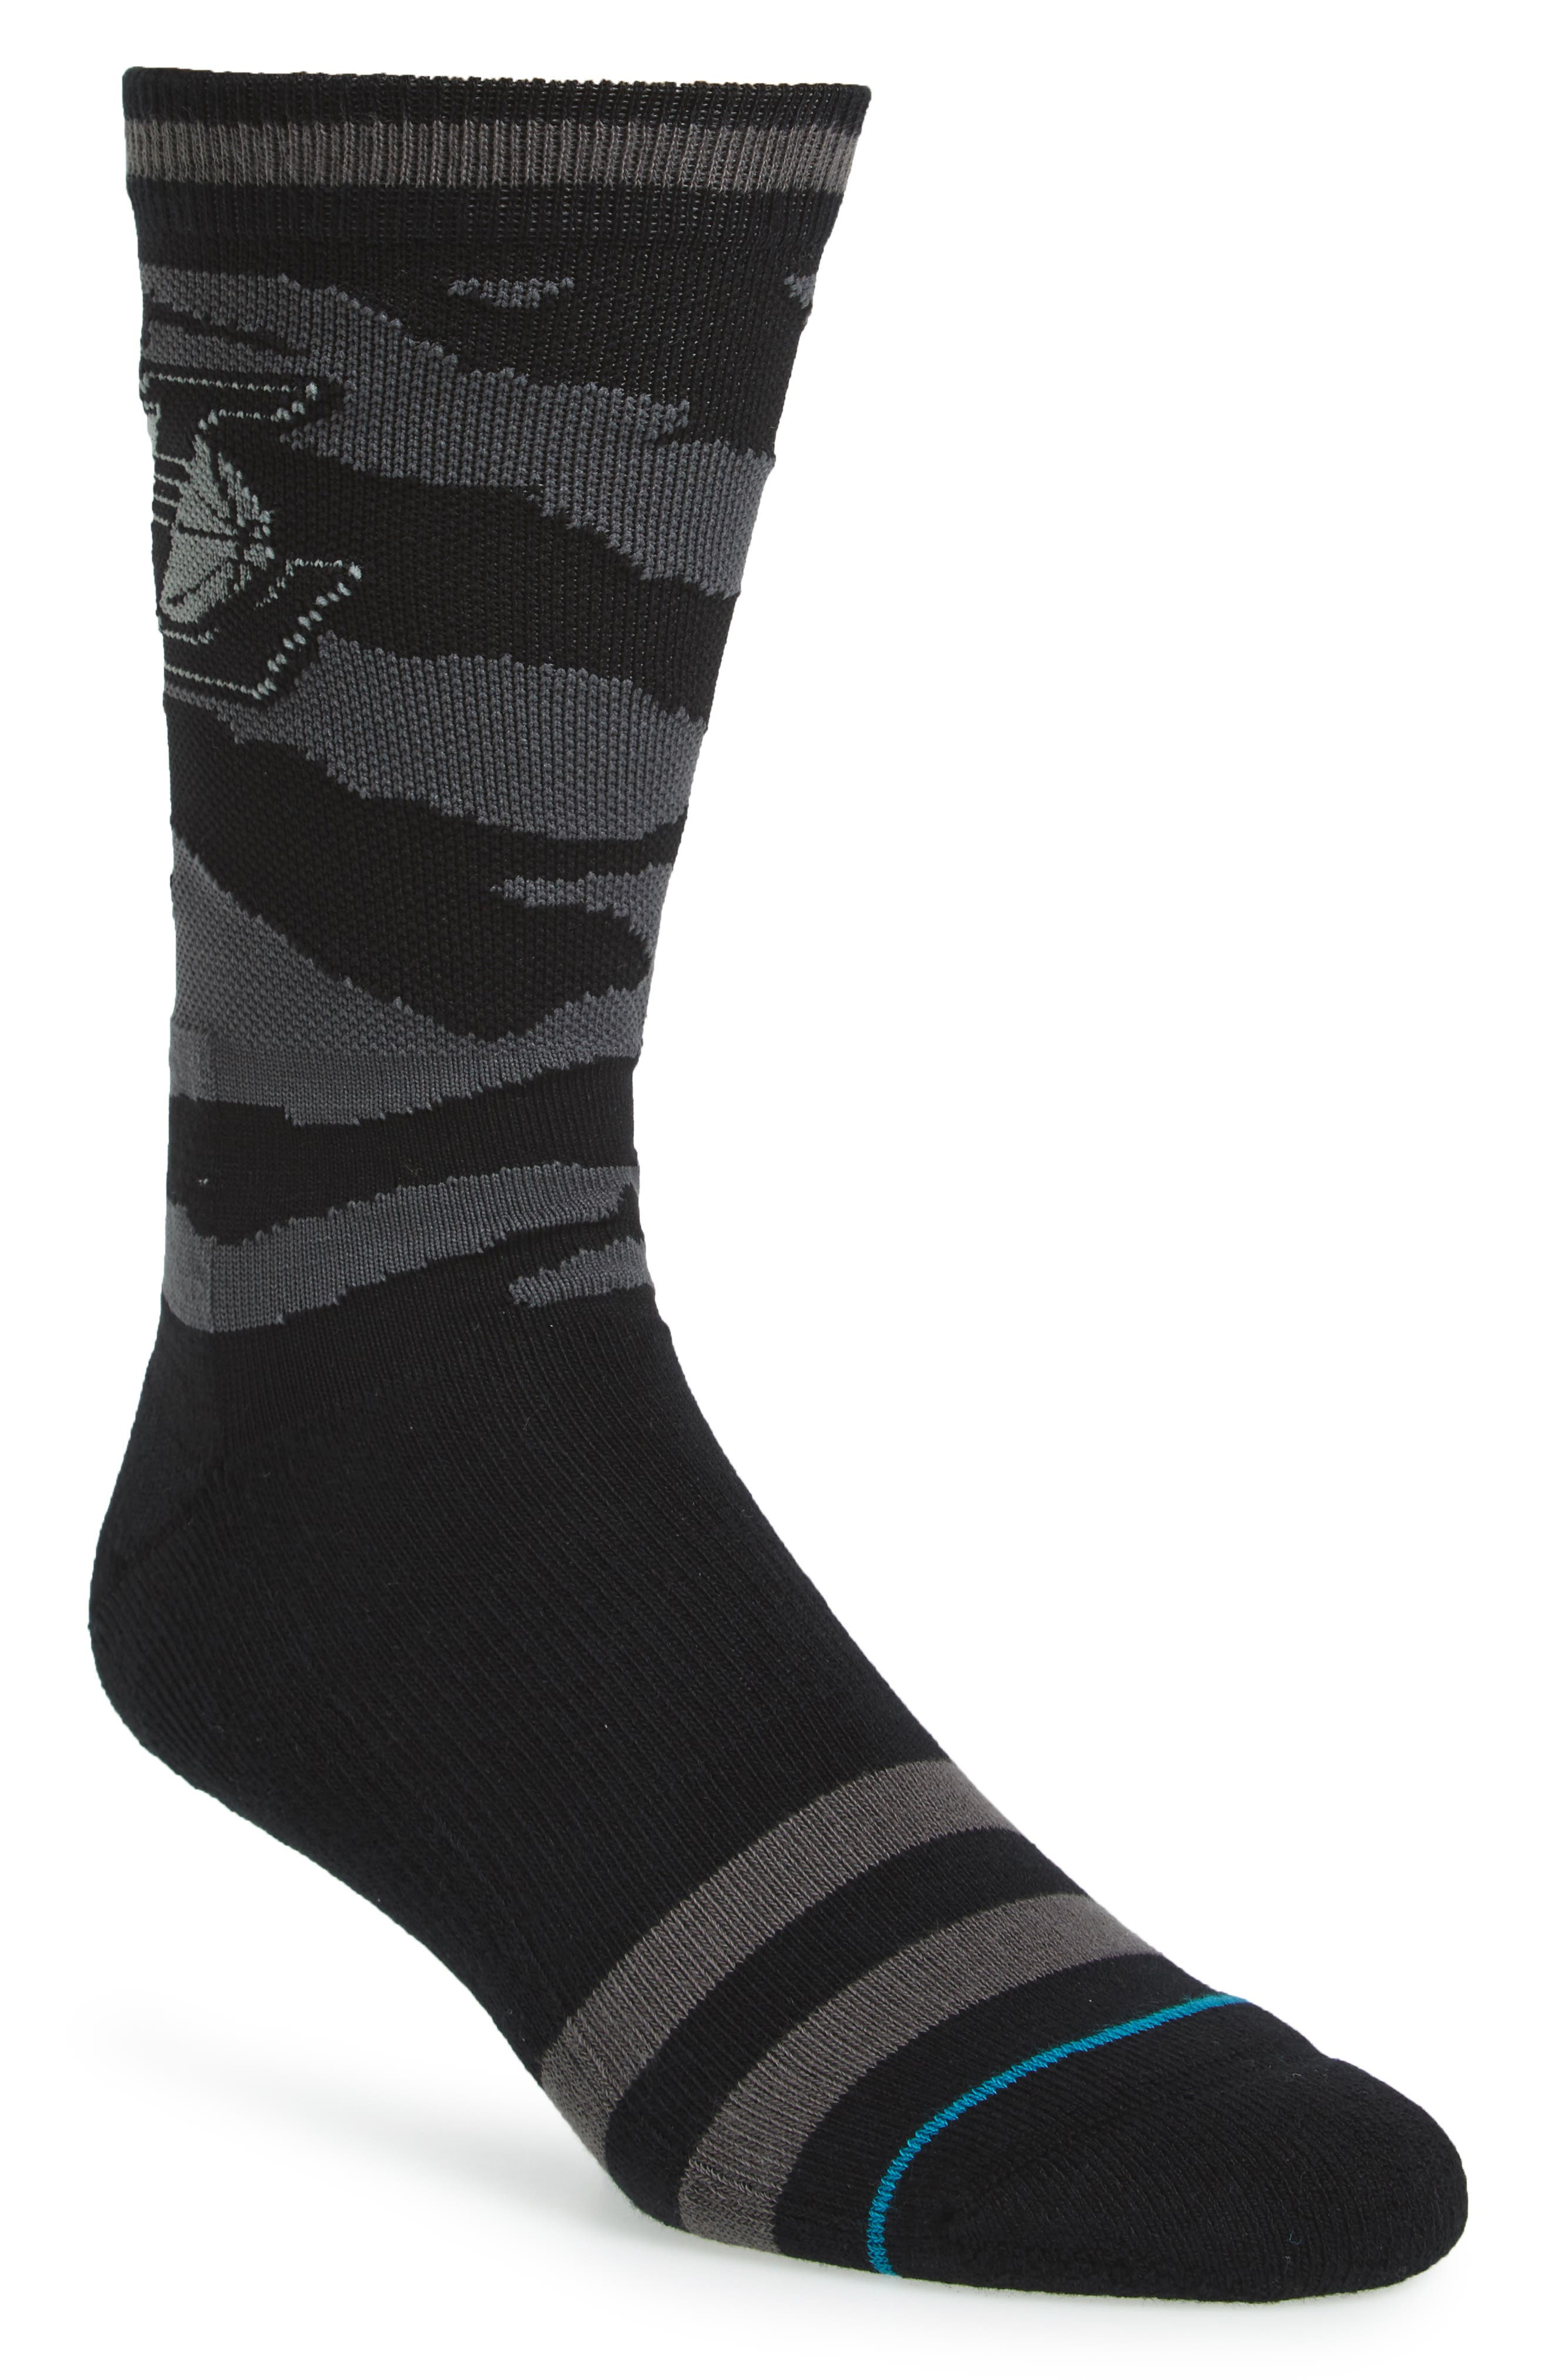 NBA Casual Nightfall Lakers Socks,                             Main thumbnail 1, color,                             001